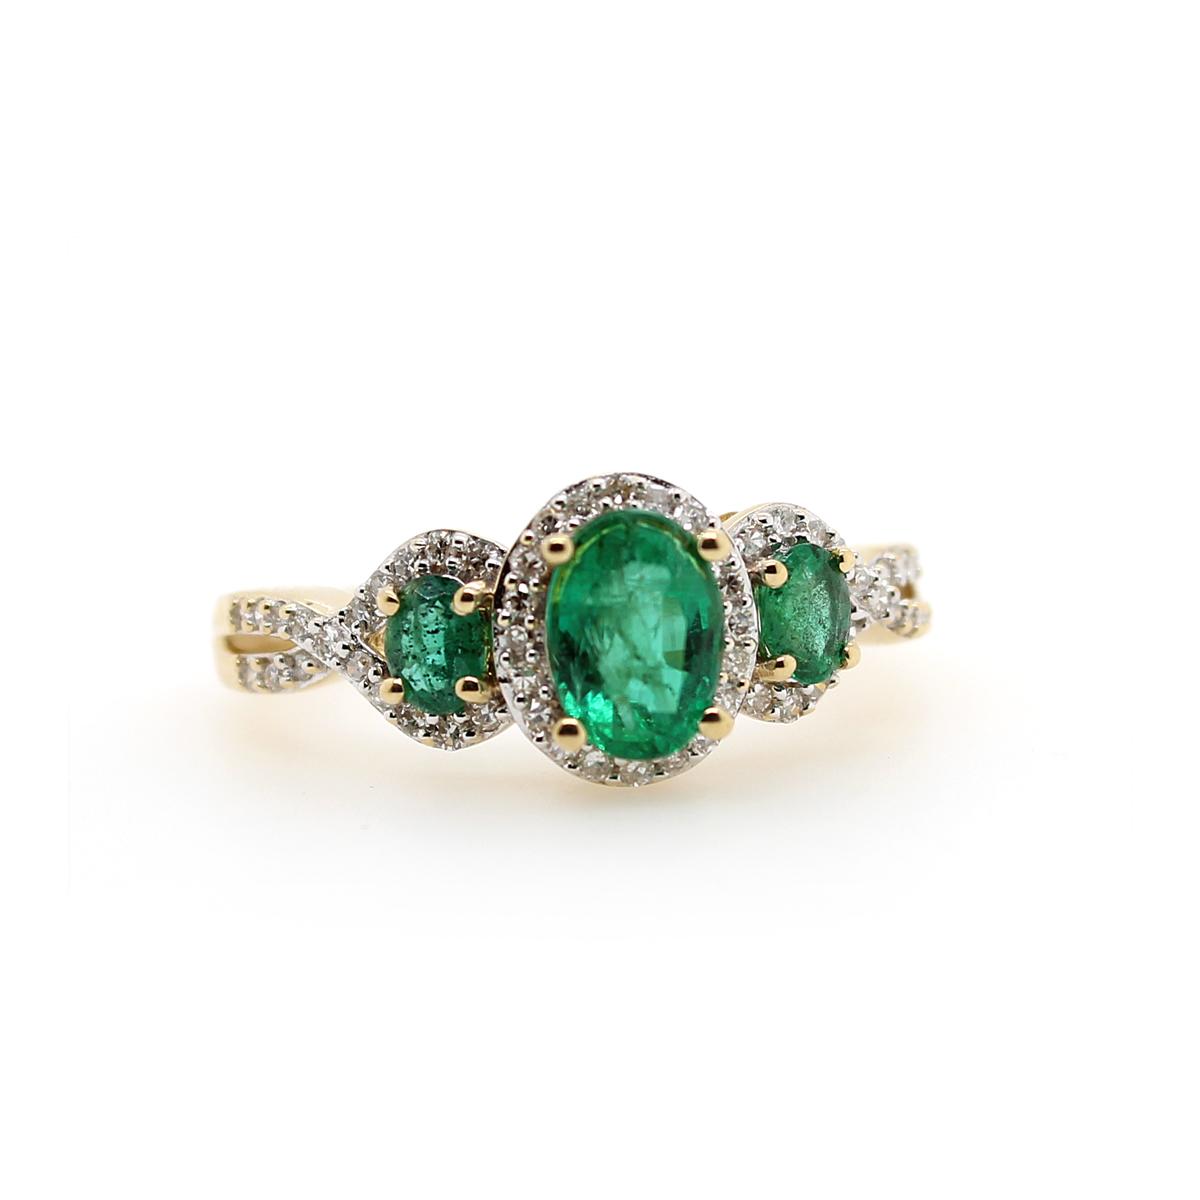 Vintage 14 Karat Yellow Gold Emerald and Diamond Ring